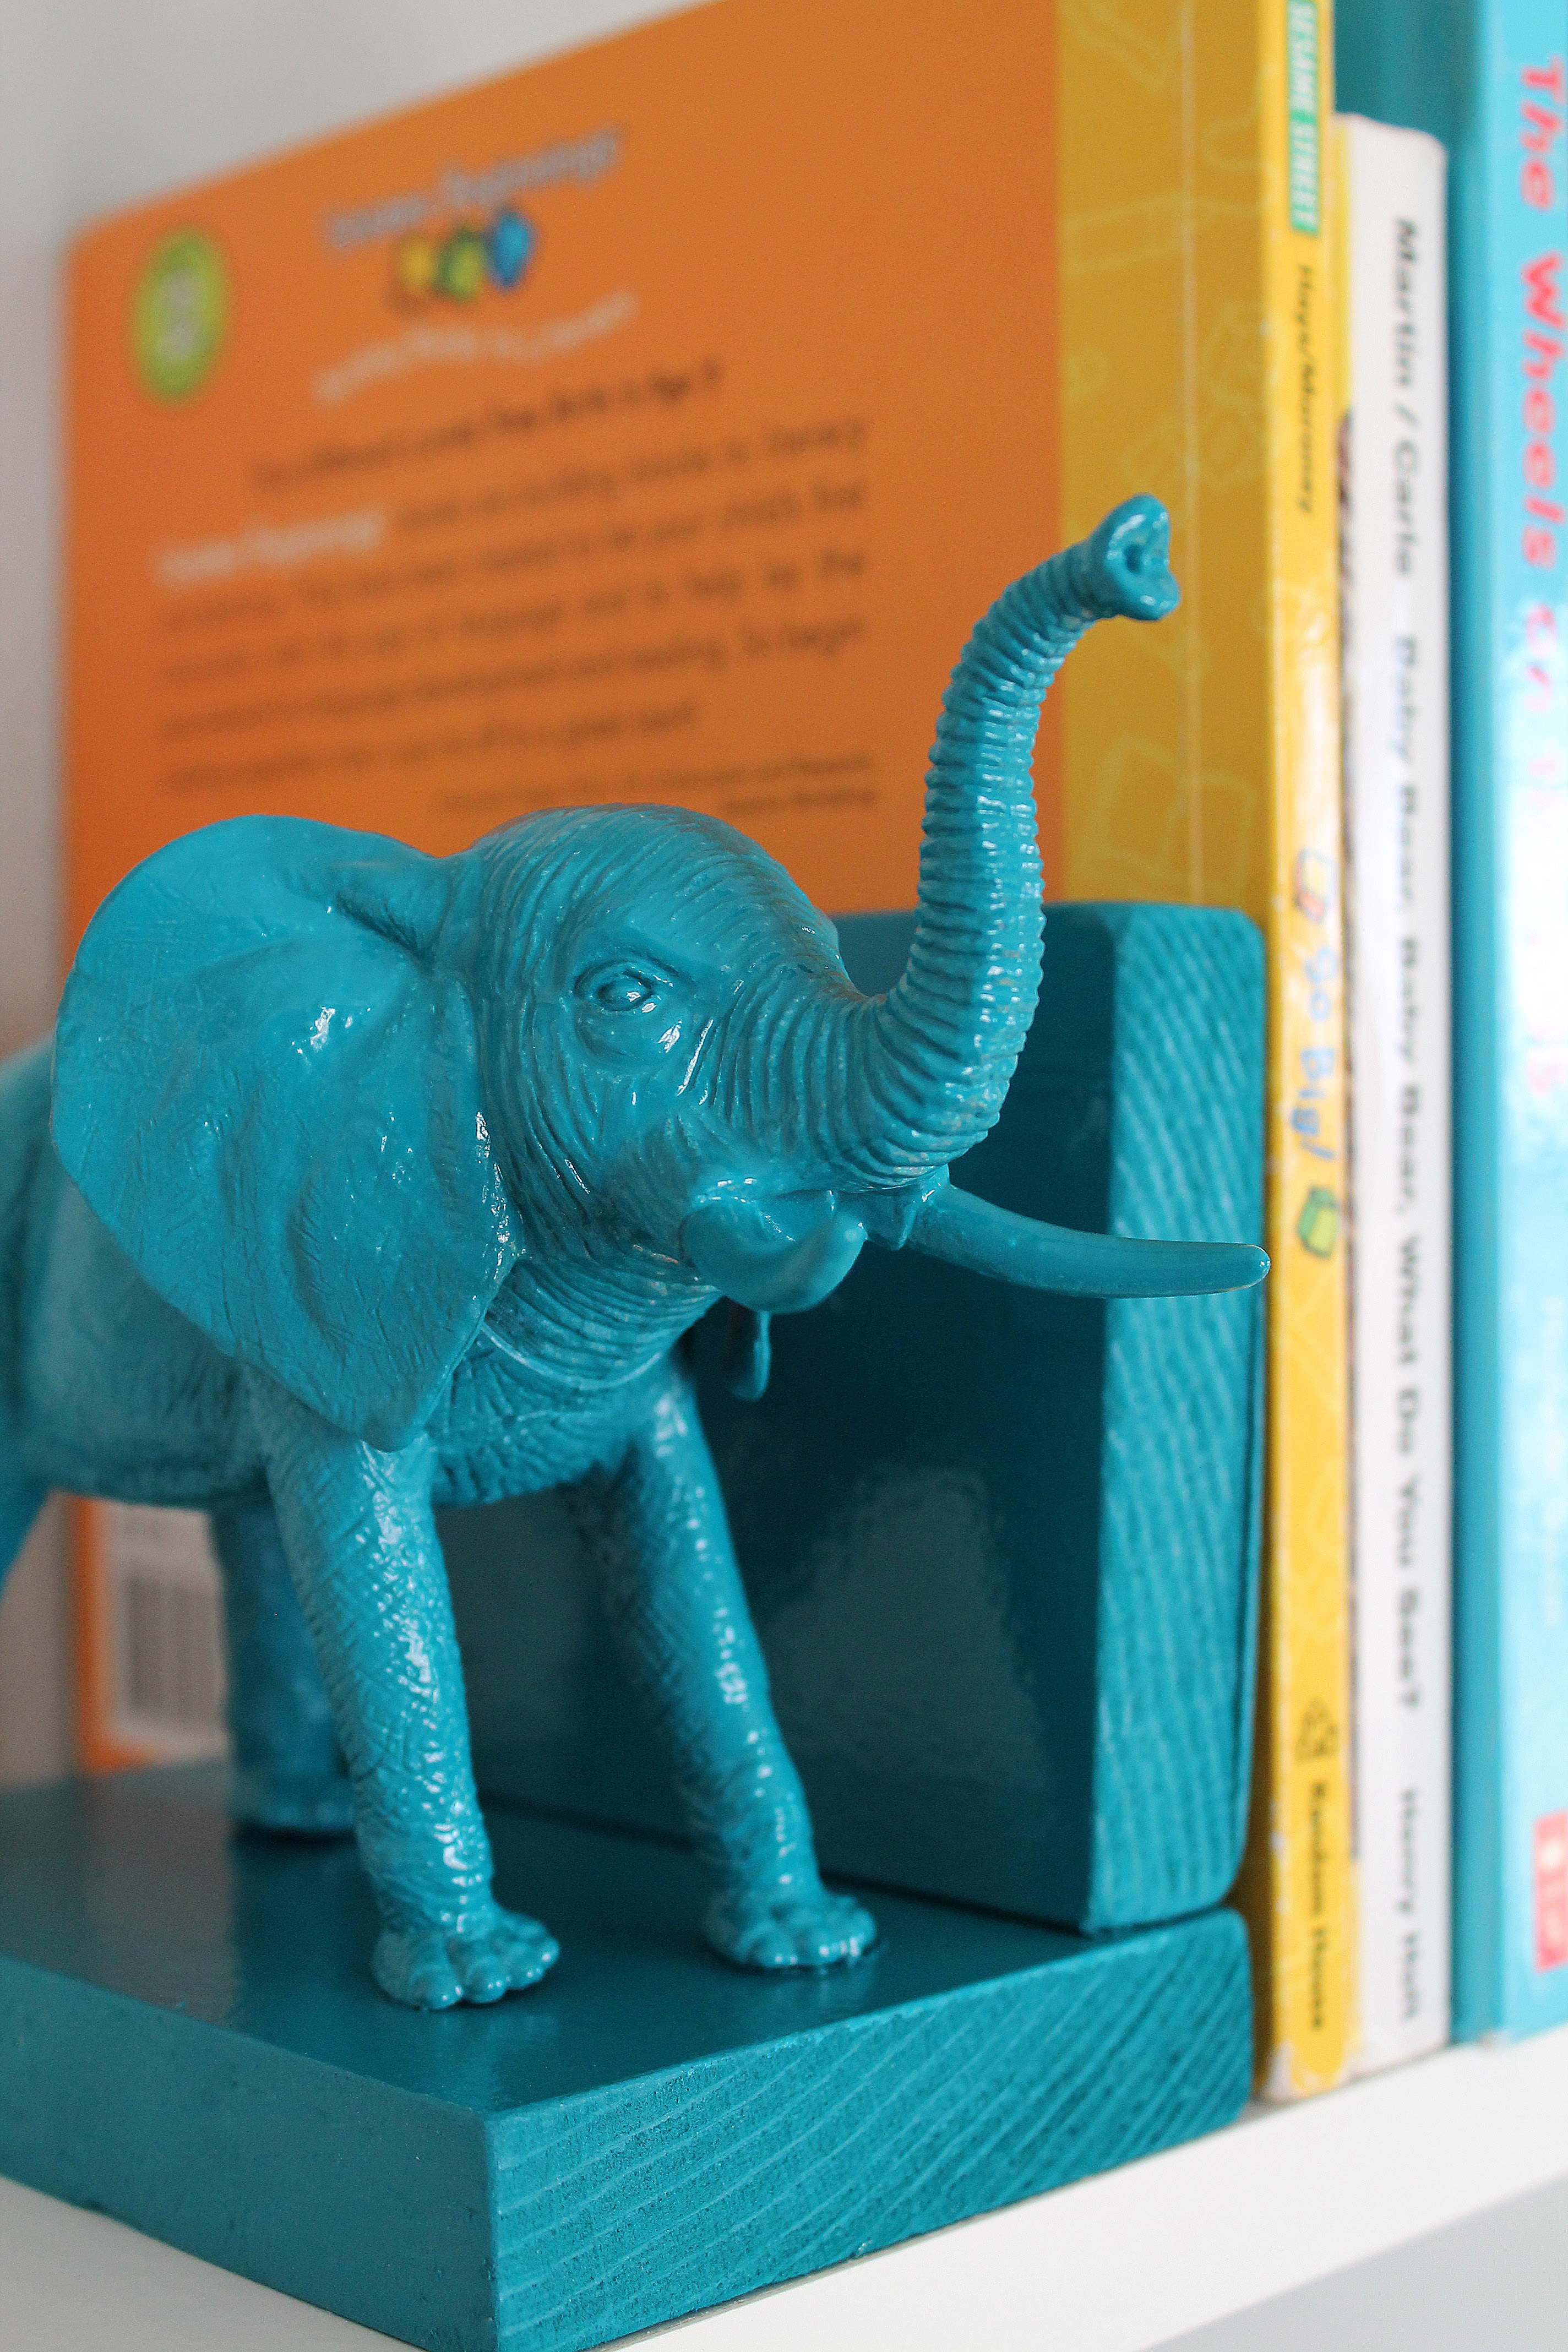 Plastic Elephant Book Ends